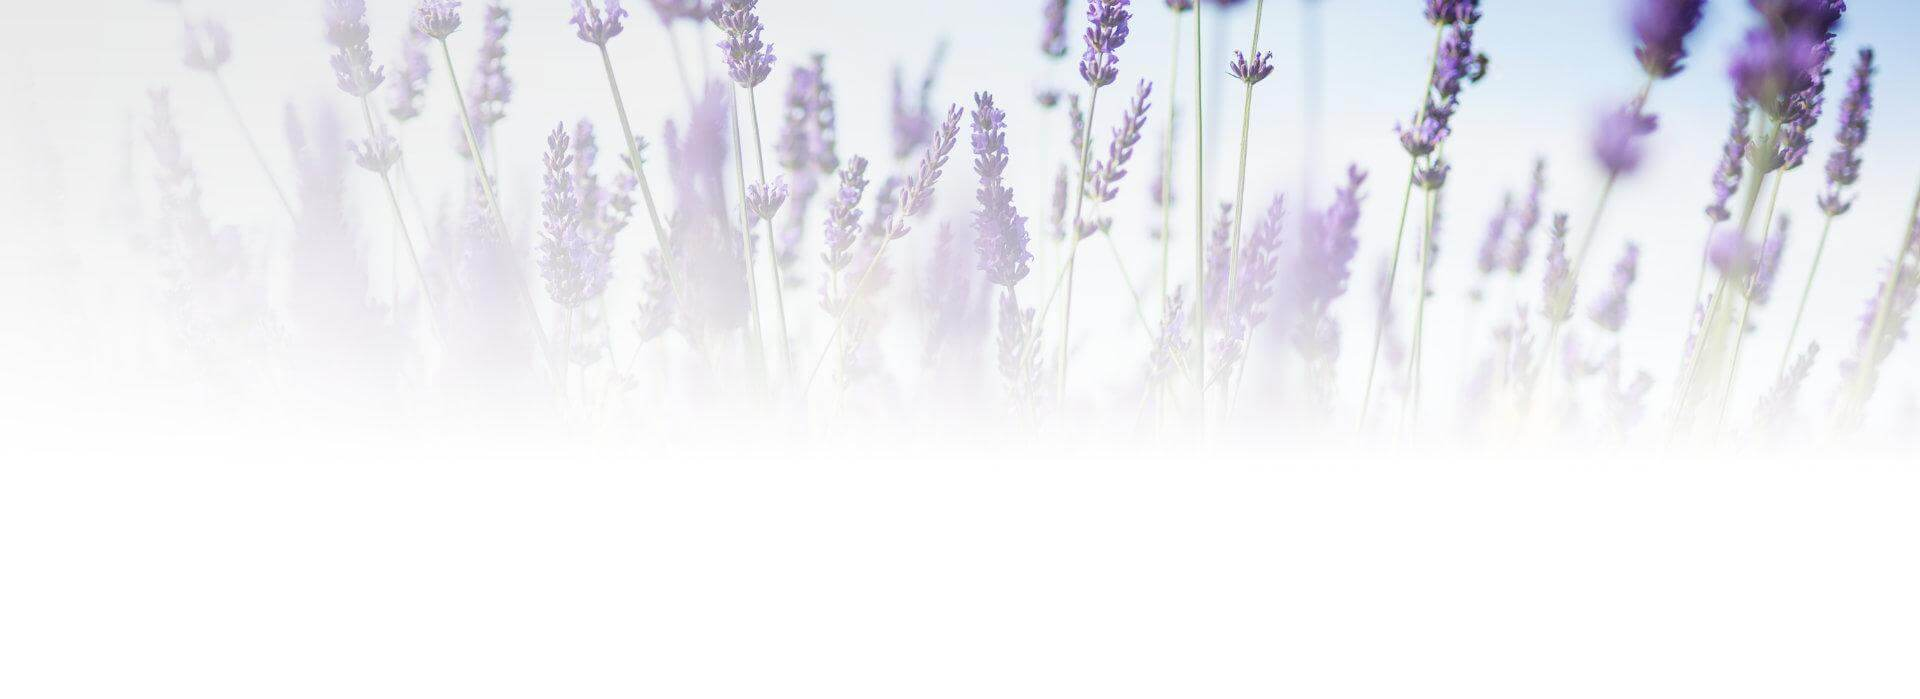 Kwiaty zapachowe